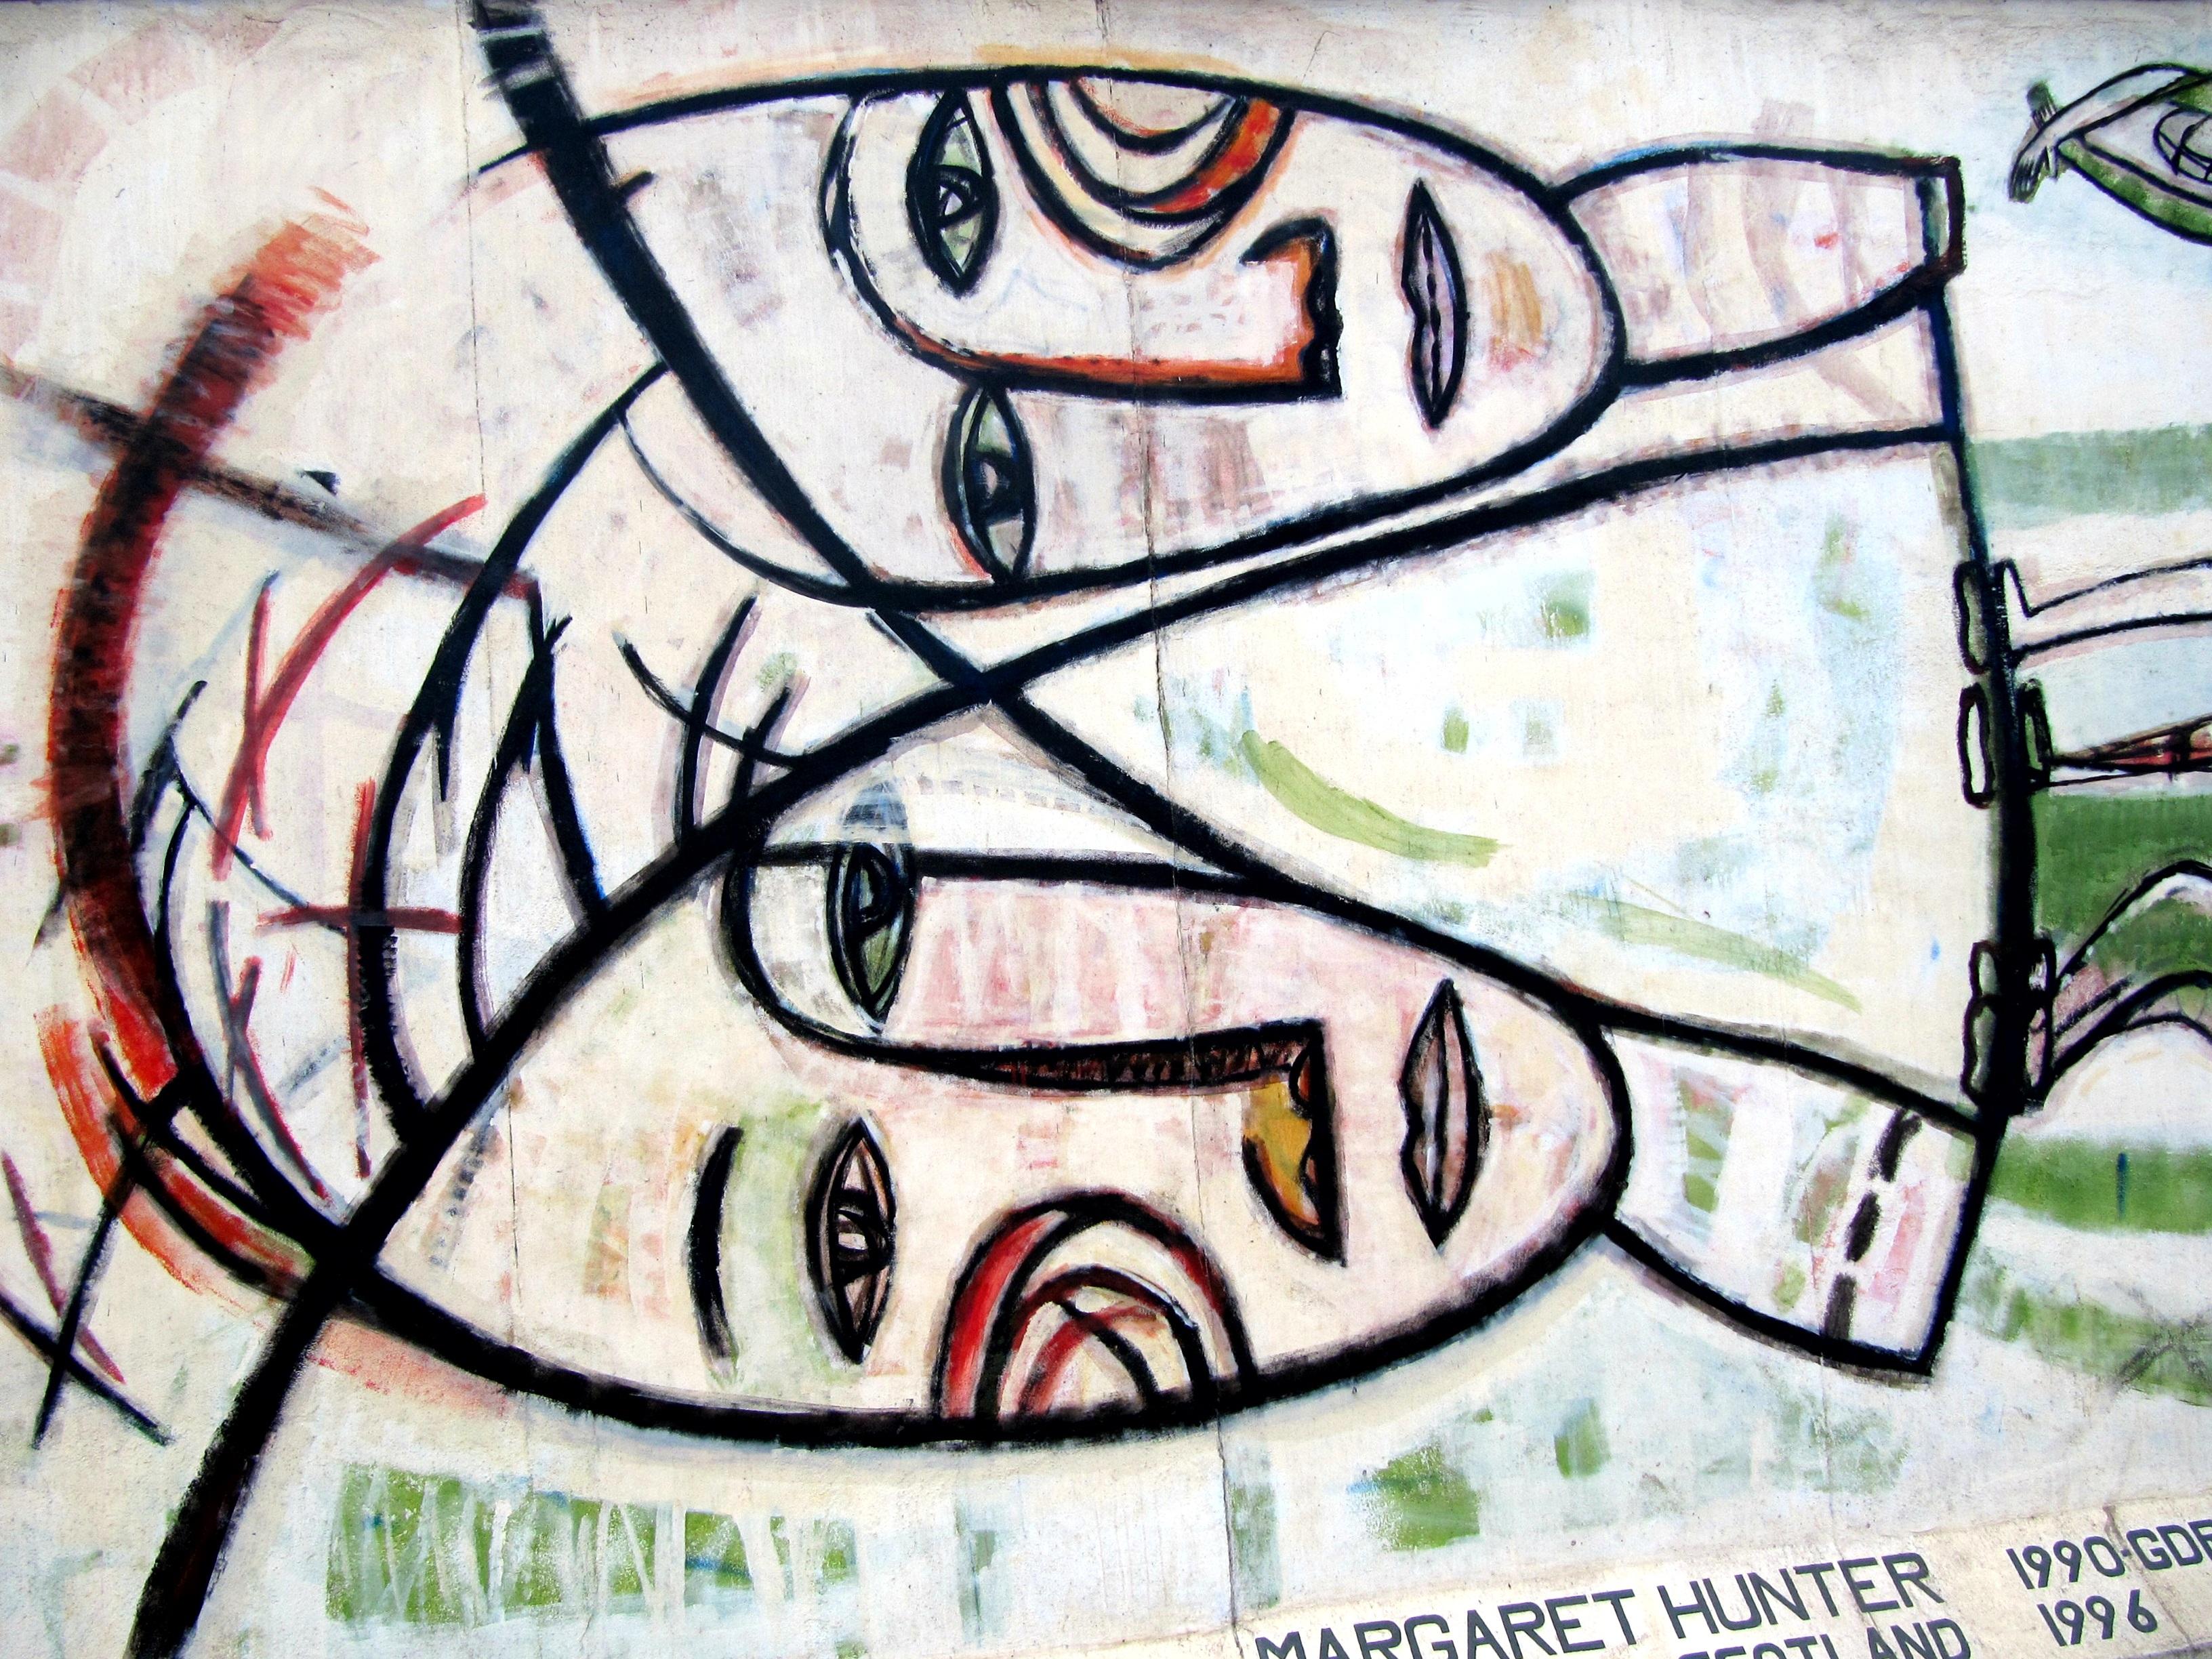 Gambar Kaca Dinding Coretan Seni Sketsa Gambar